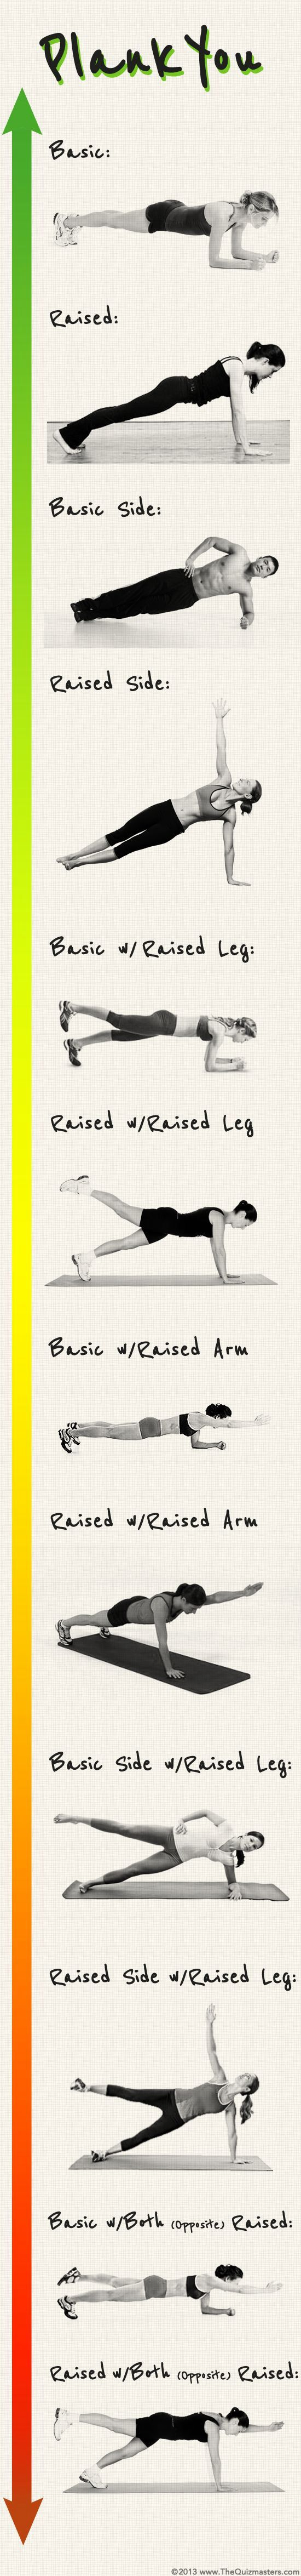 Fitness Motivation PLANK